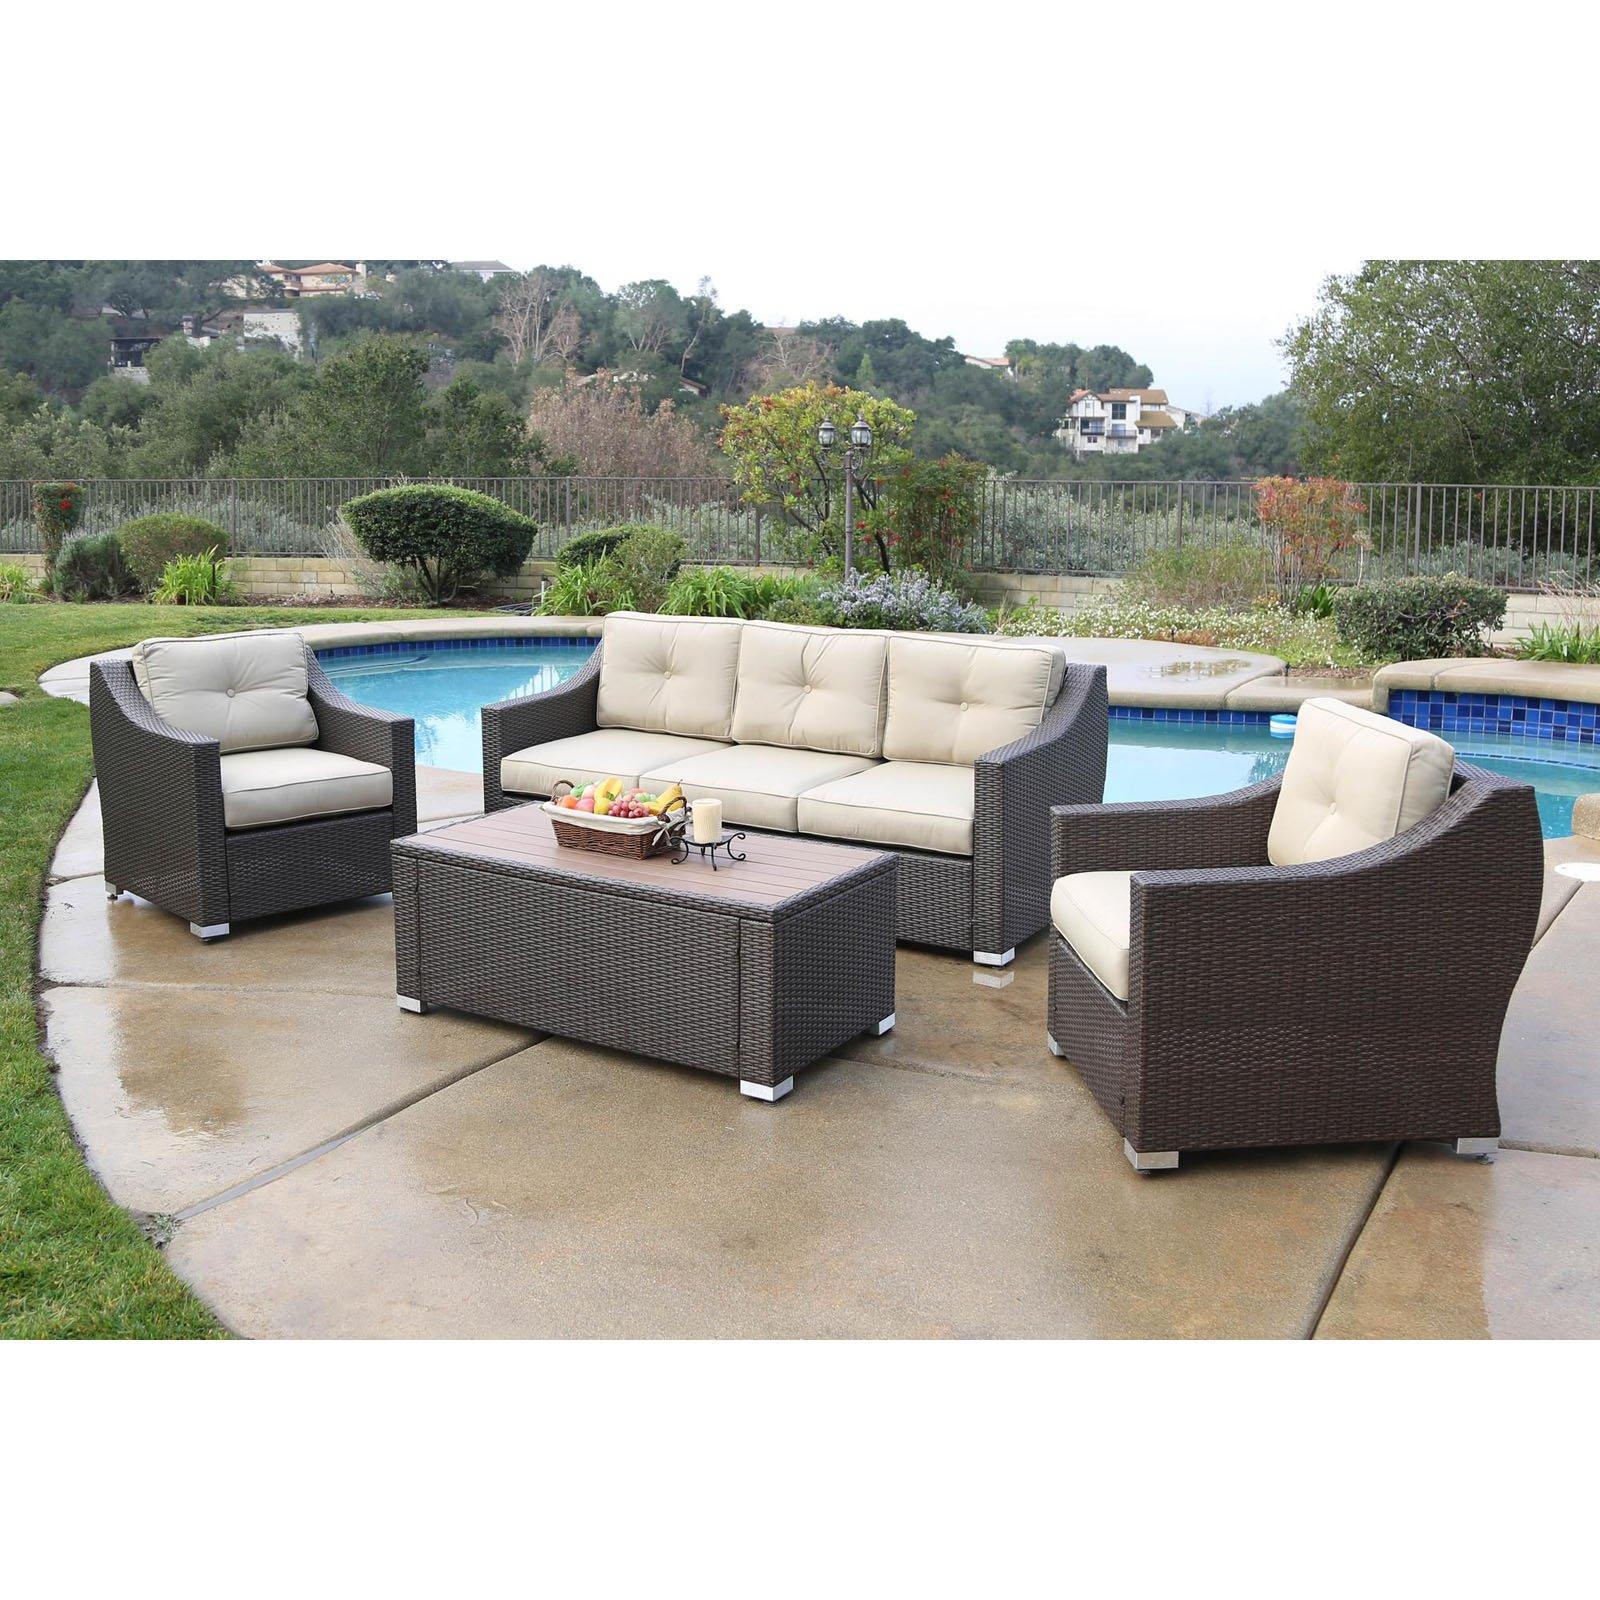 Outdoor Jj Designs South Beach Wicker 4 Piece Deep Seating Sofa